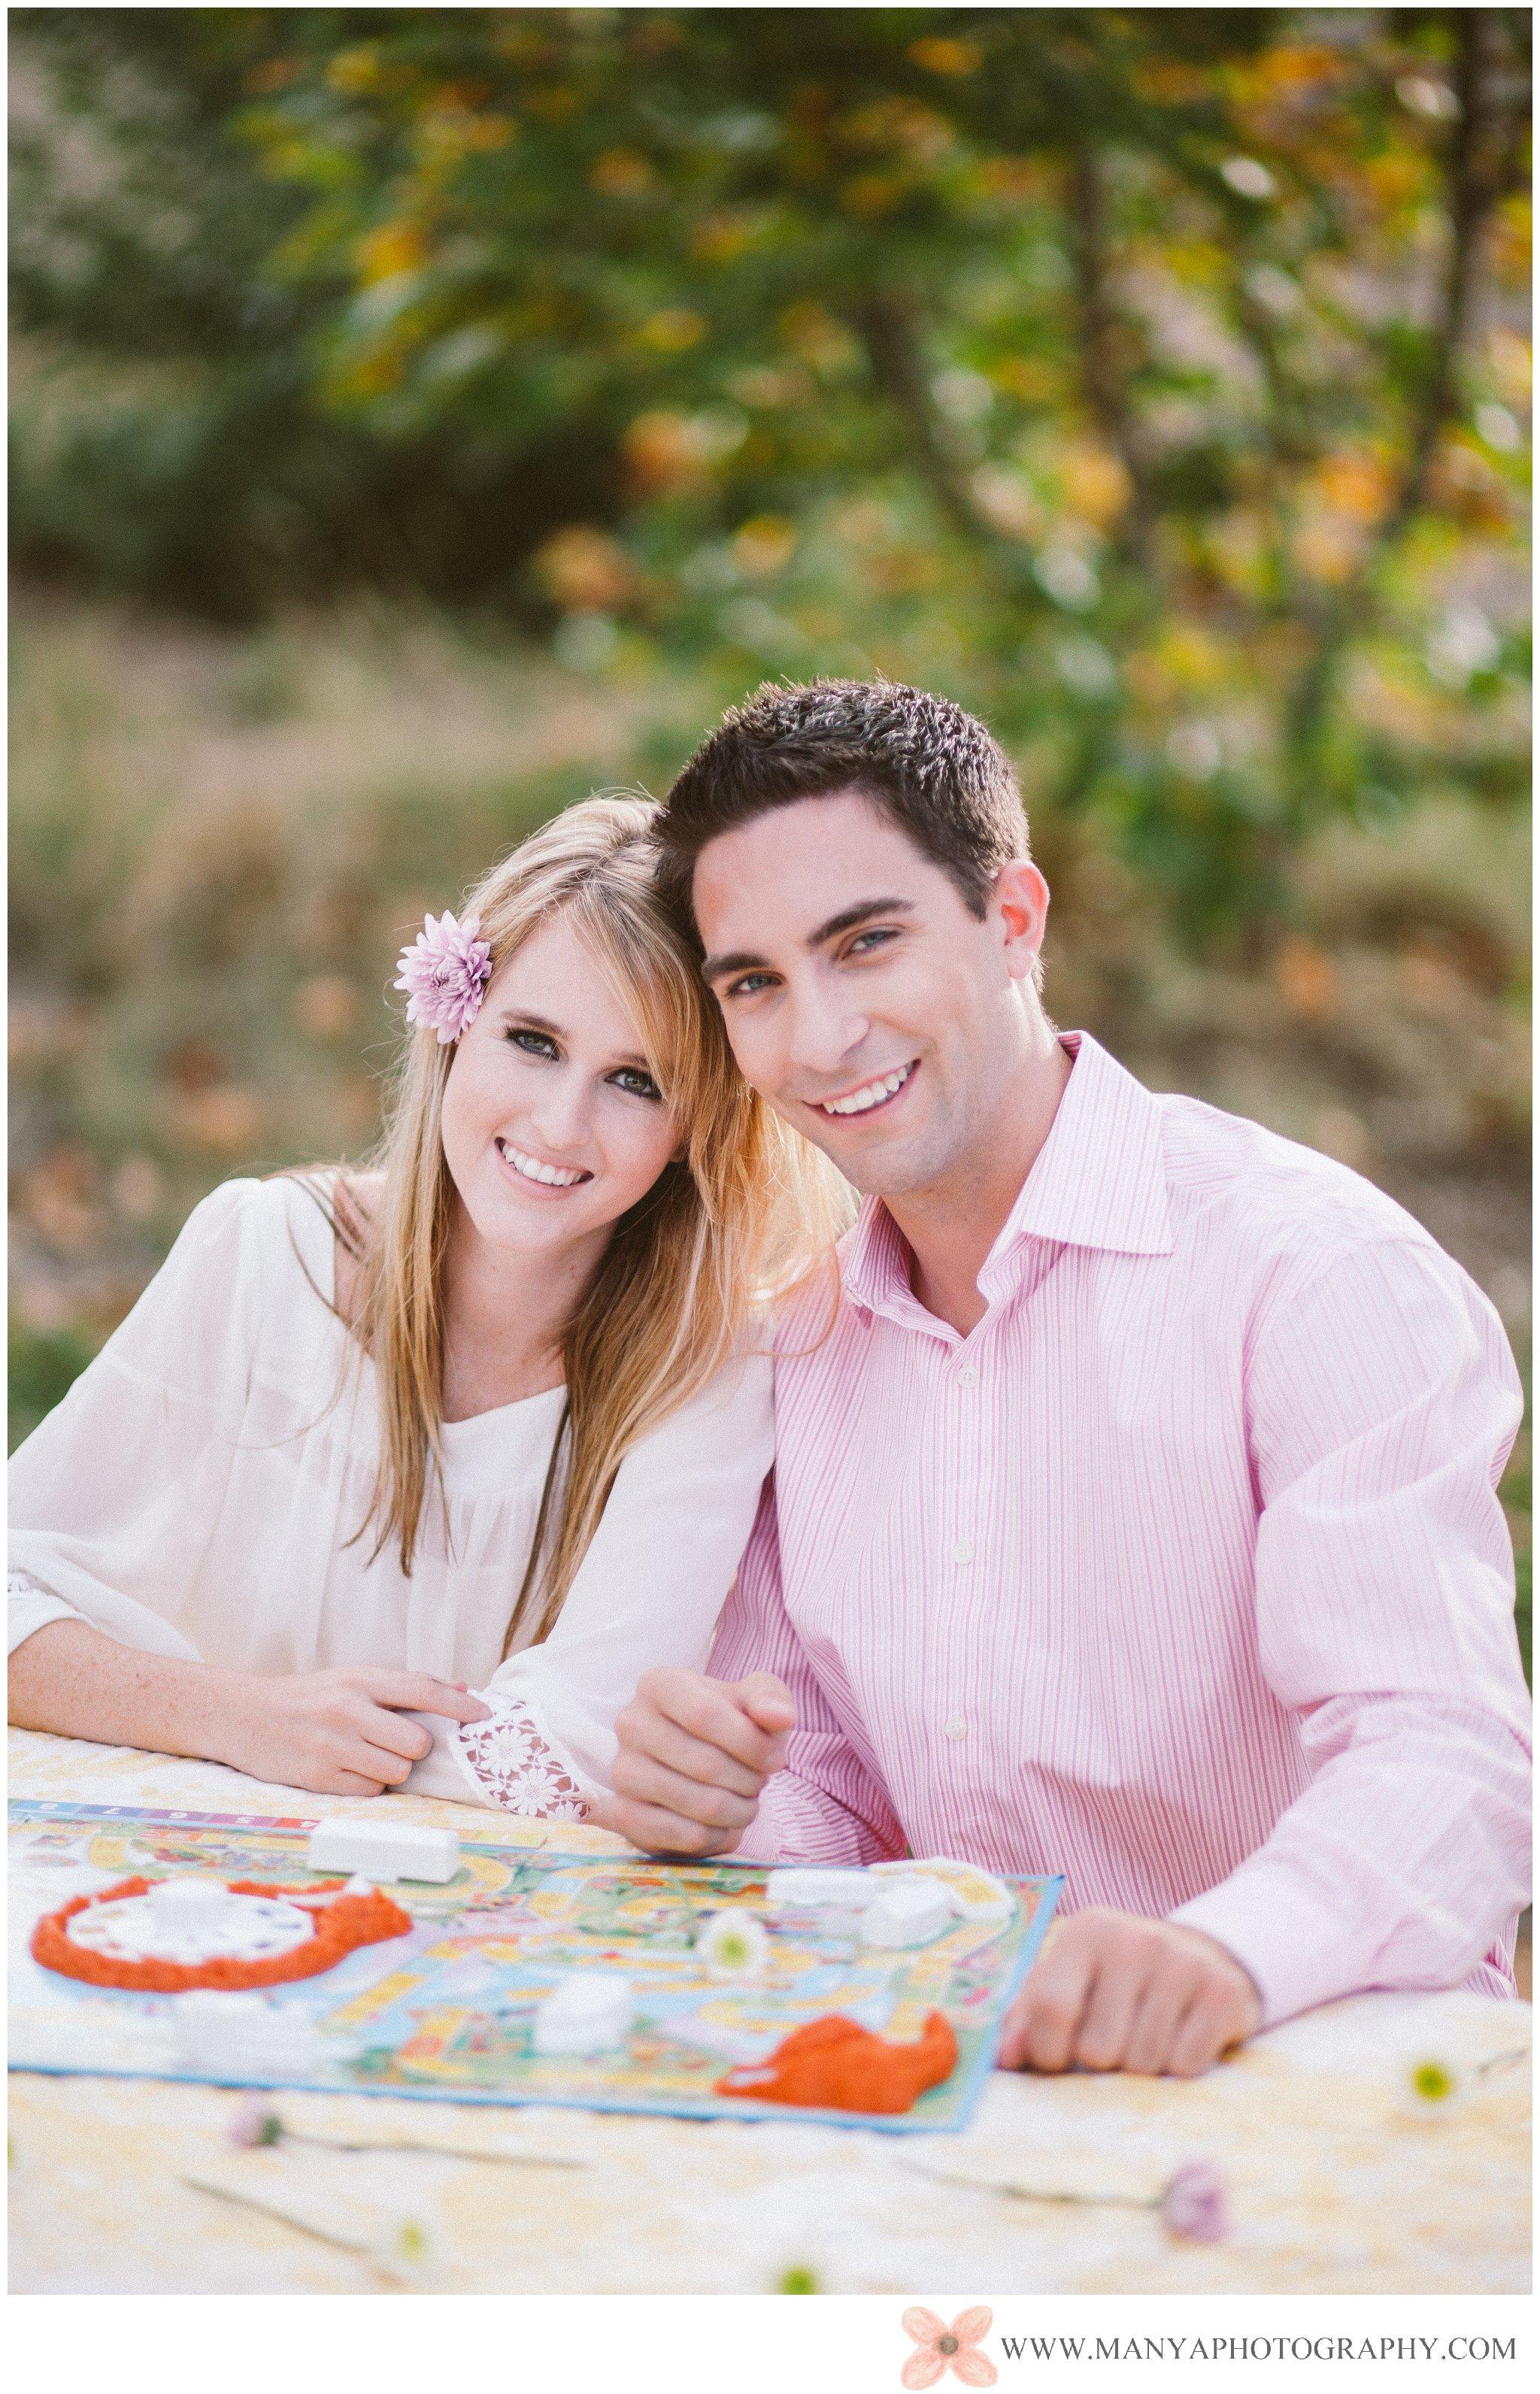 2013-10-17_0026 - Orange County Wedding Photographer